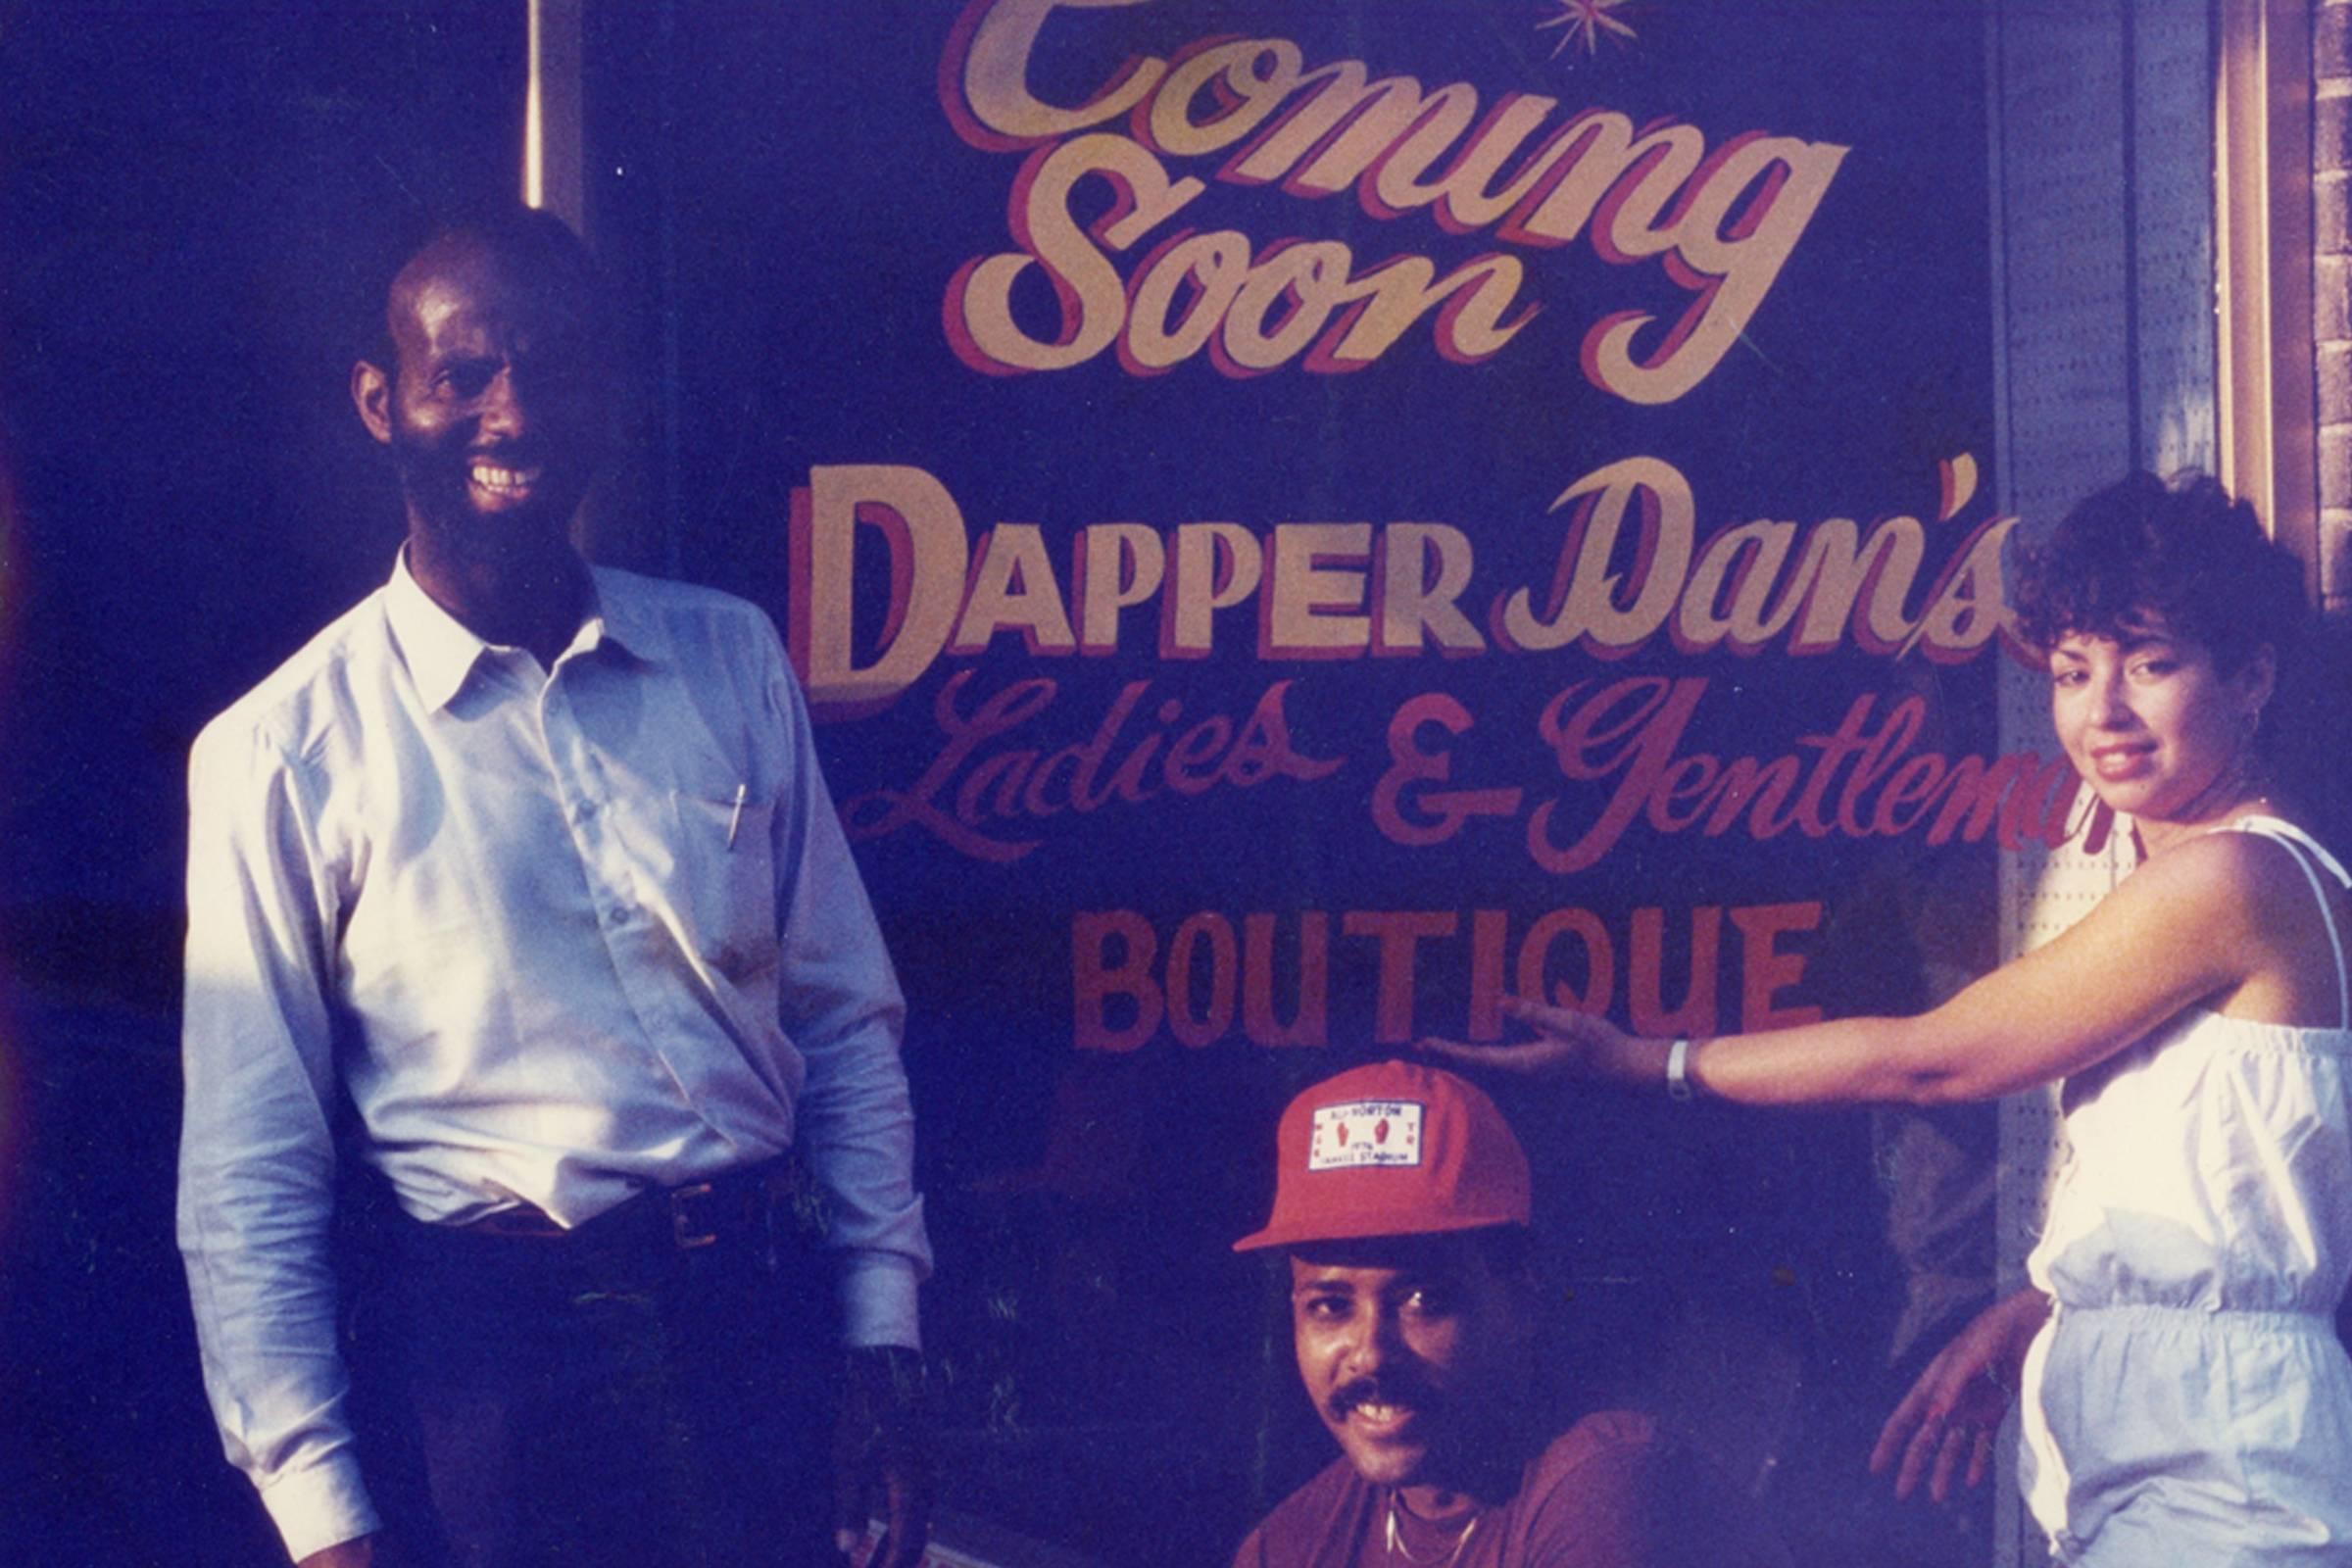 dapper-dan-storefront-1983